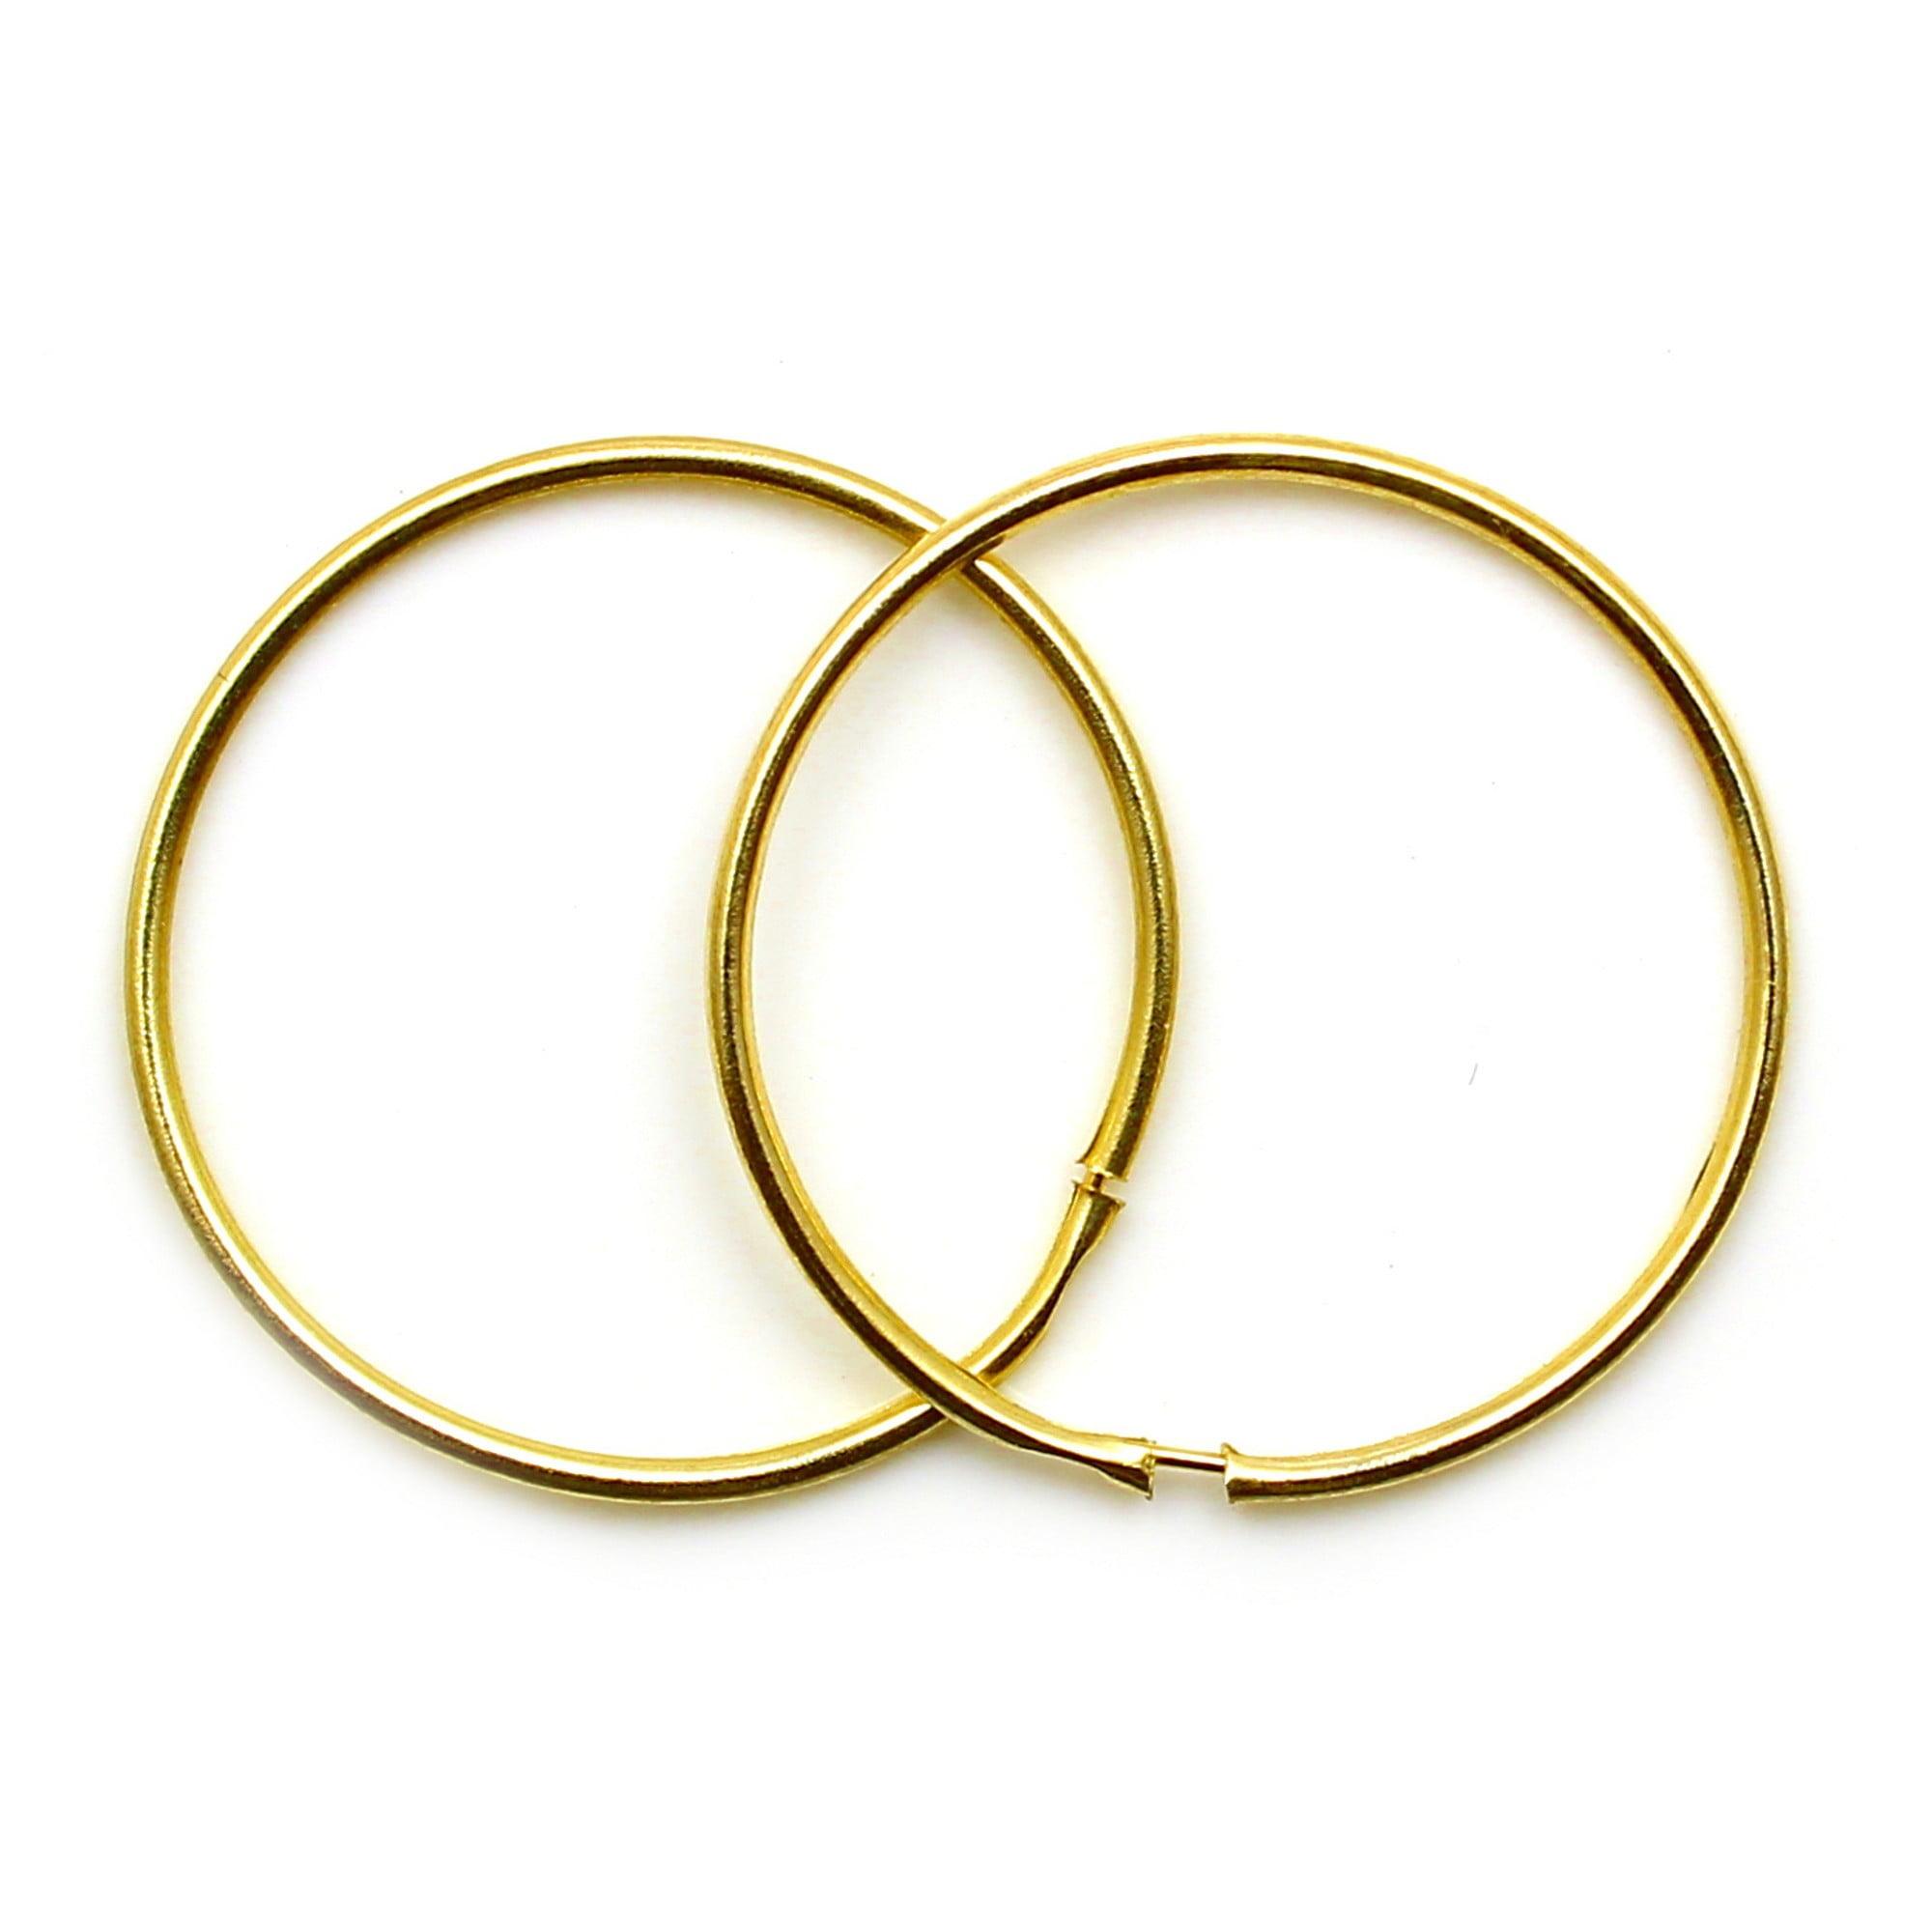 9ct Gold Diamond Cut Sleeper Earrings- 22 mm HMeBTjuD